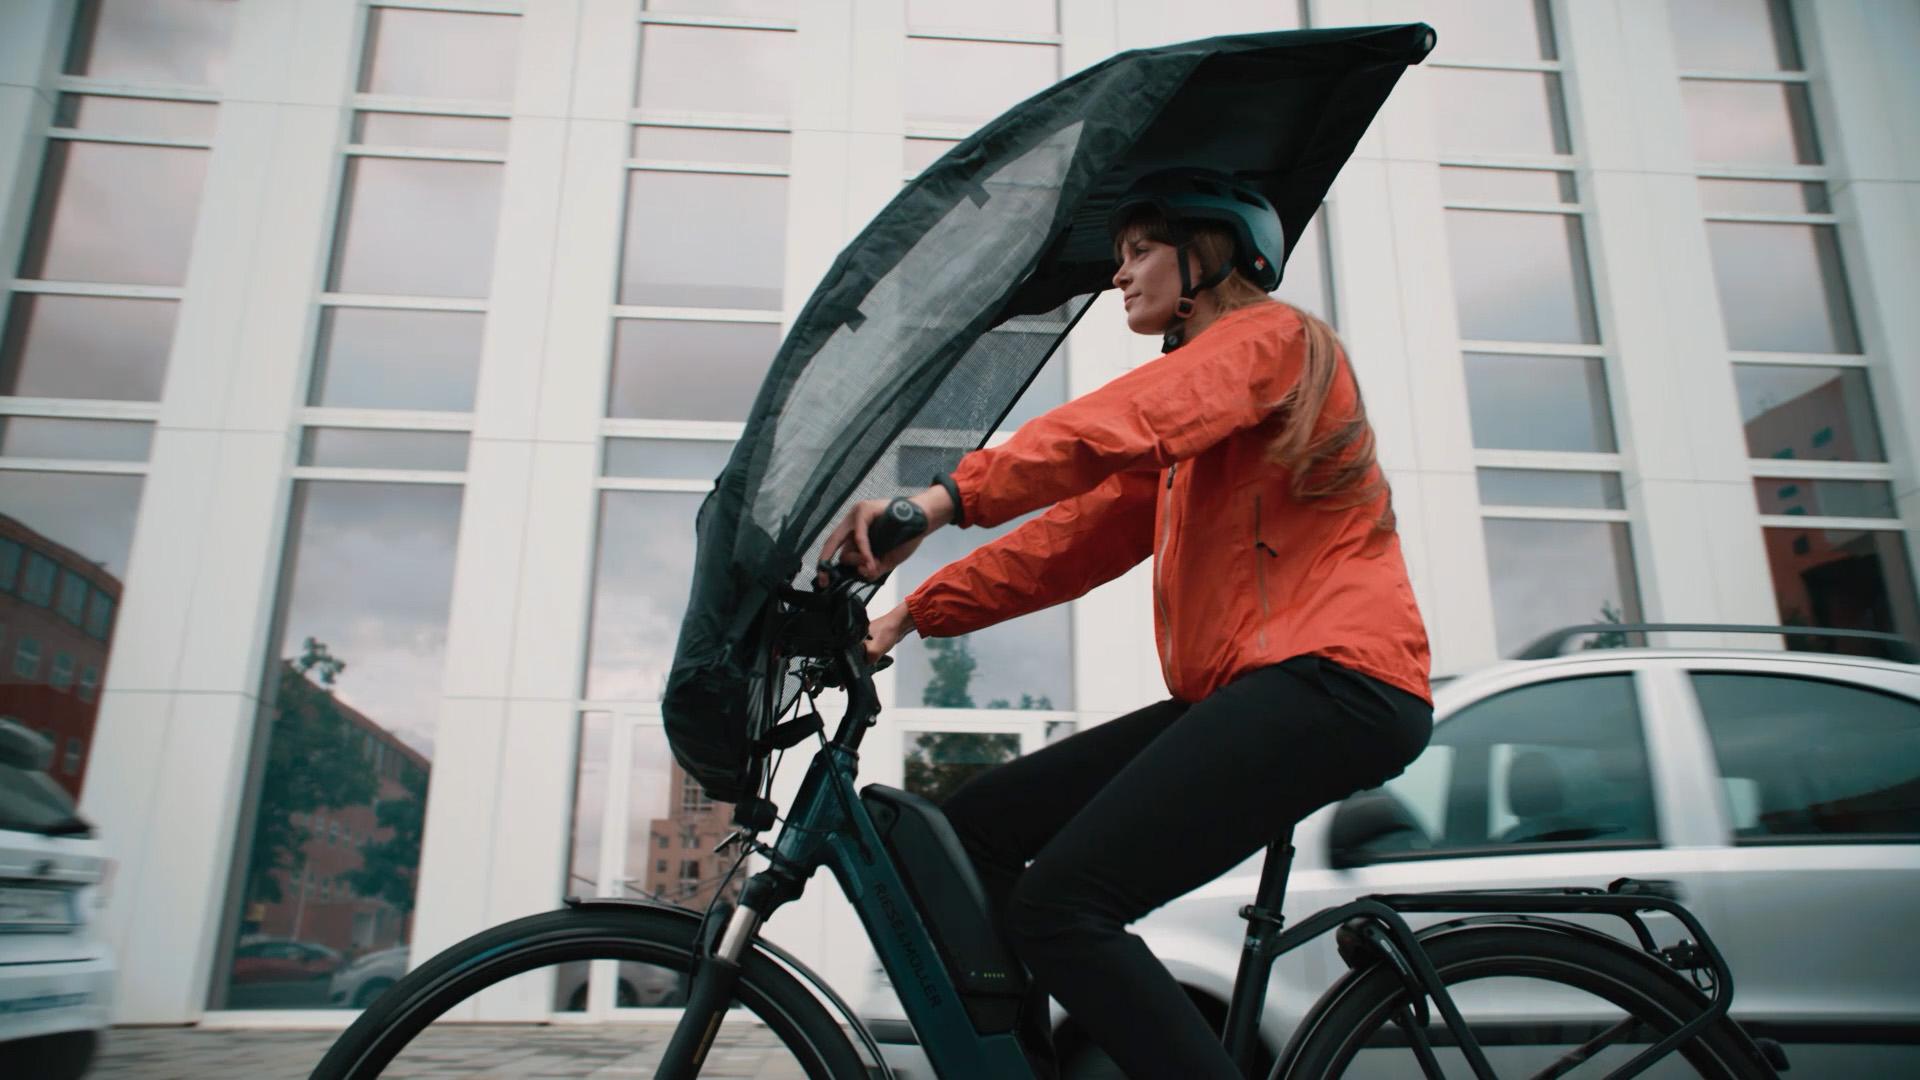 The BikerTop is presently on Indiegogo